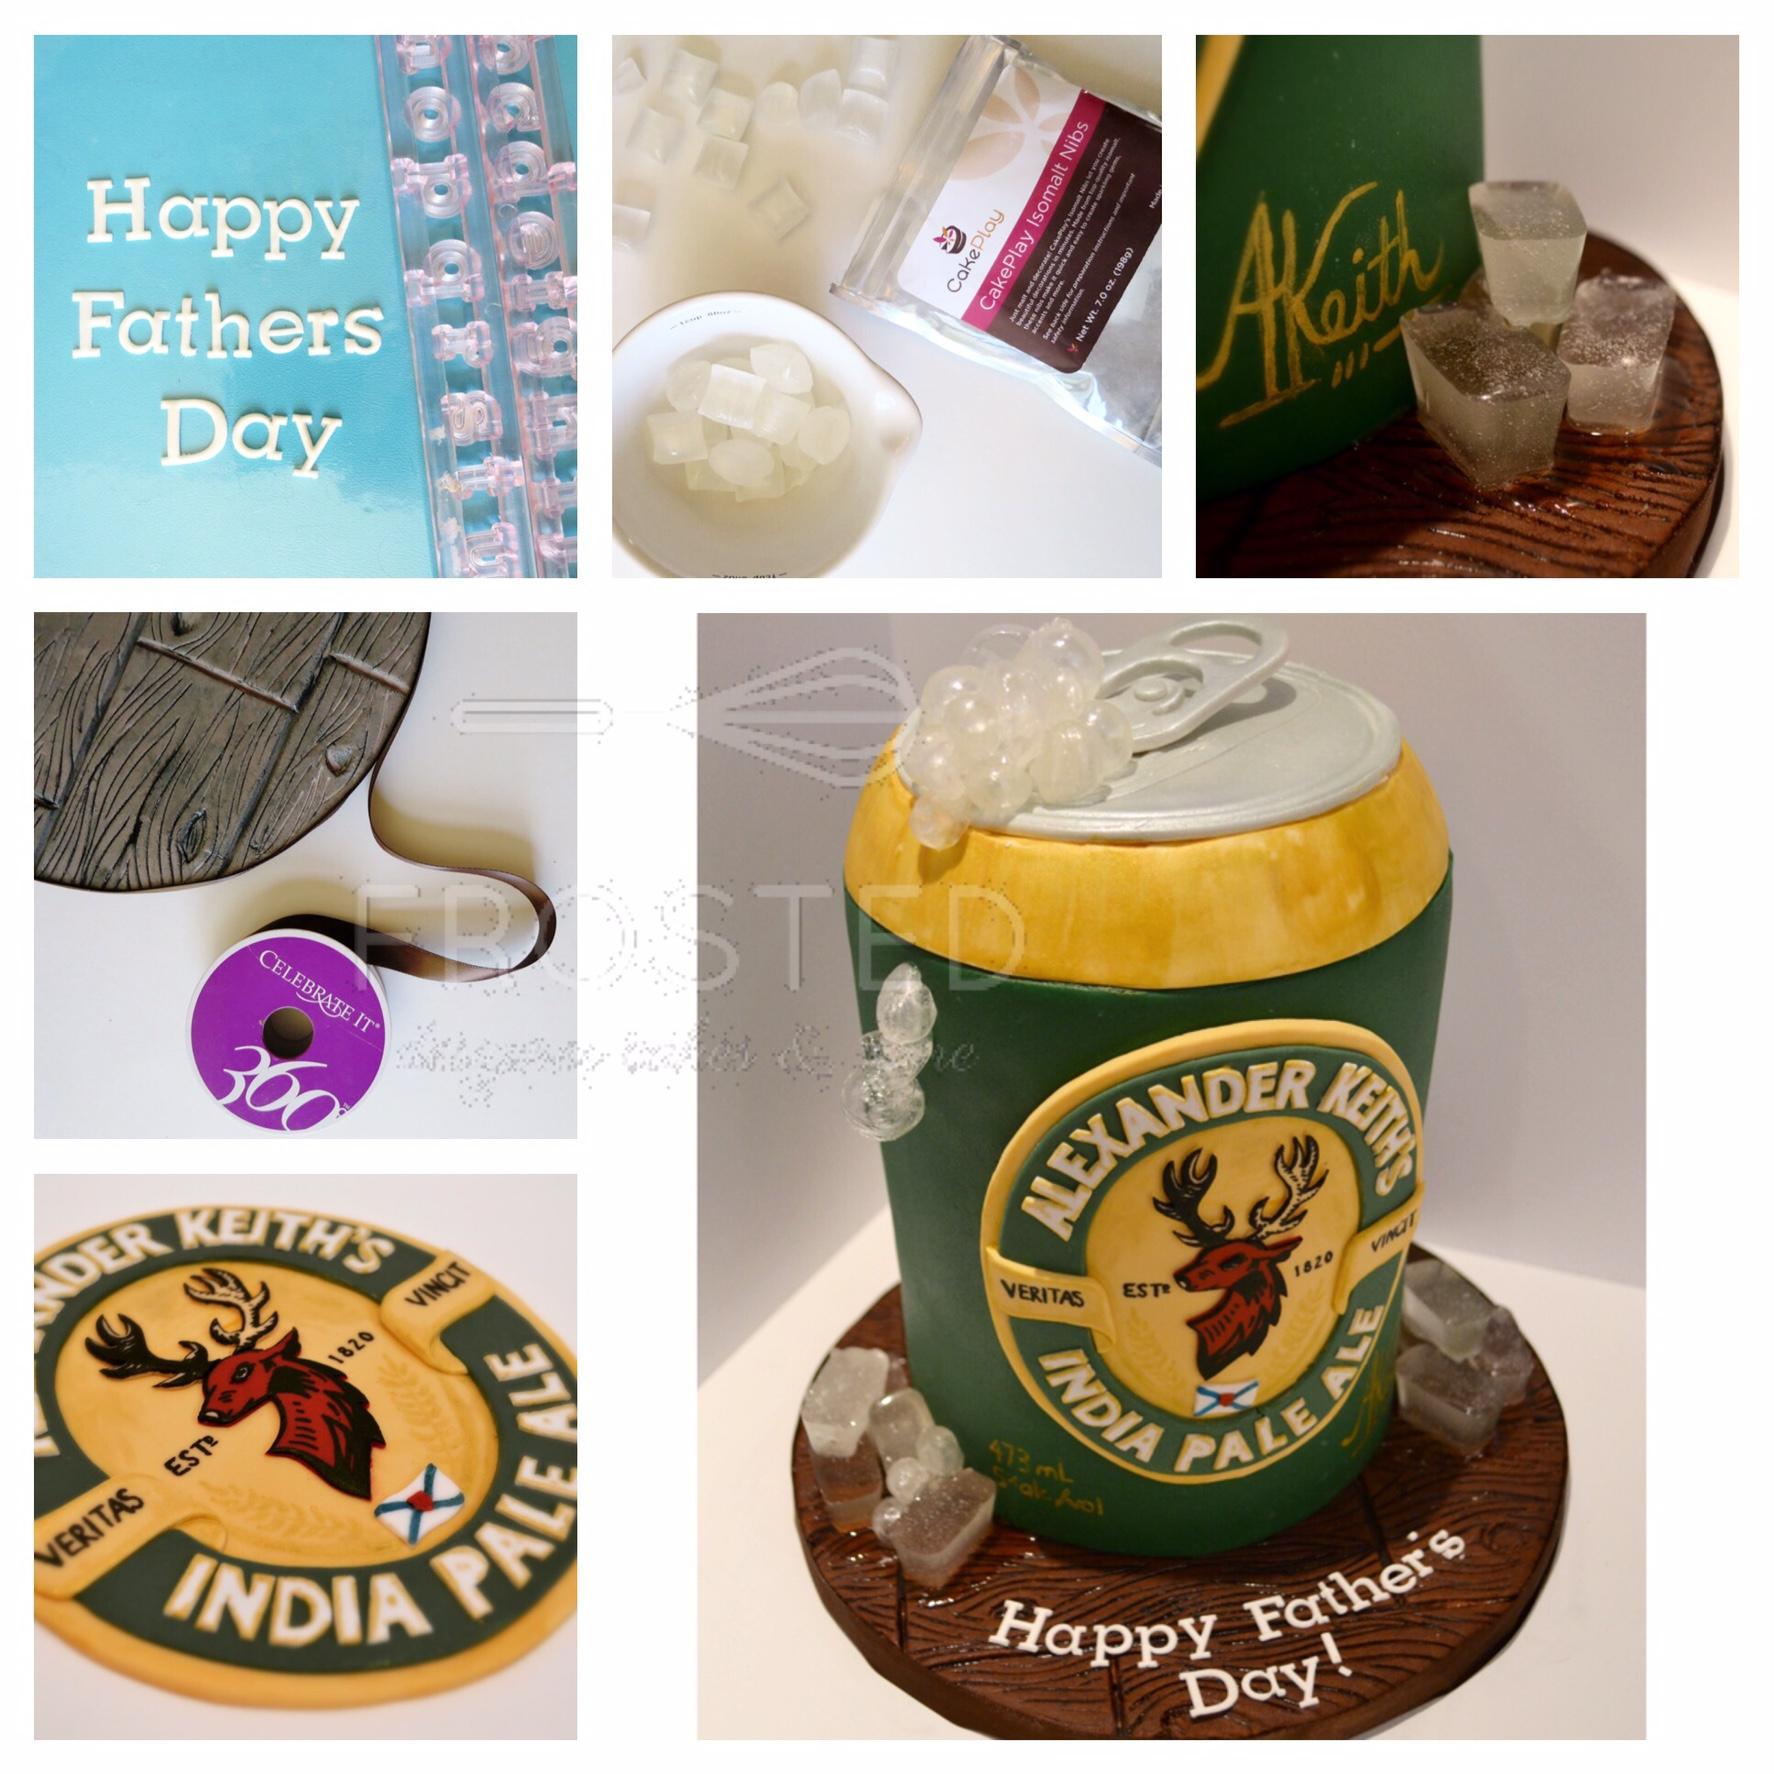 Beer-can-cake-1.JPG#asset:18694